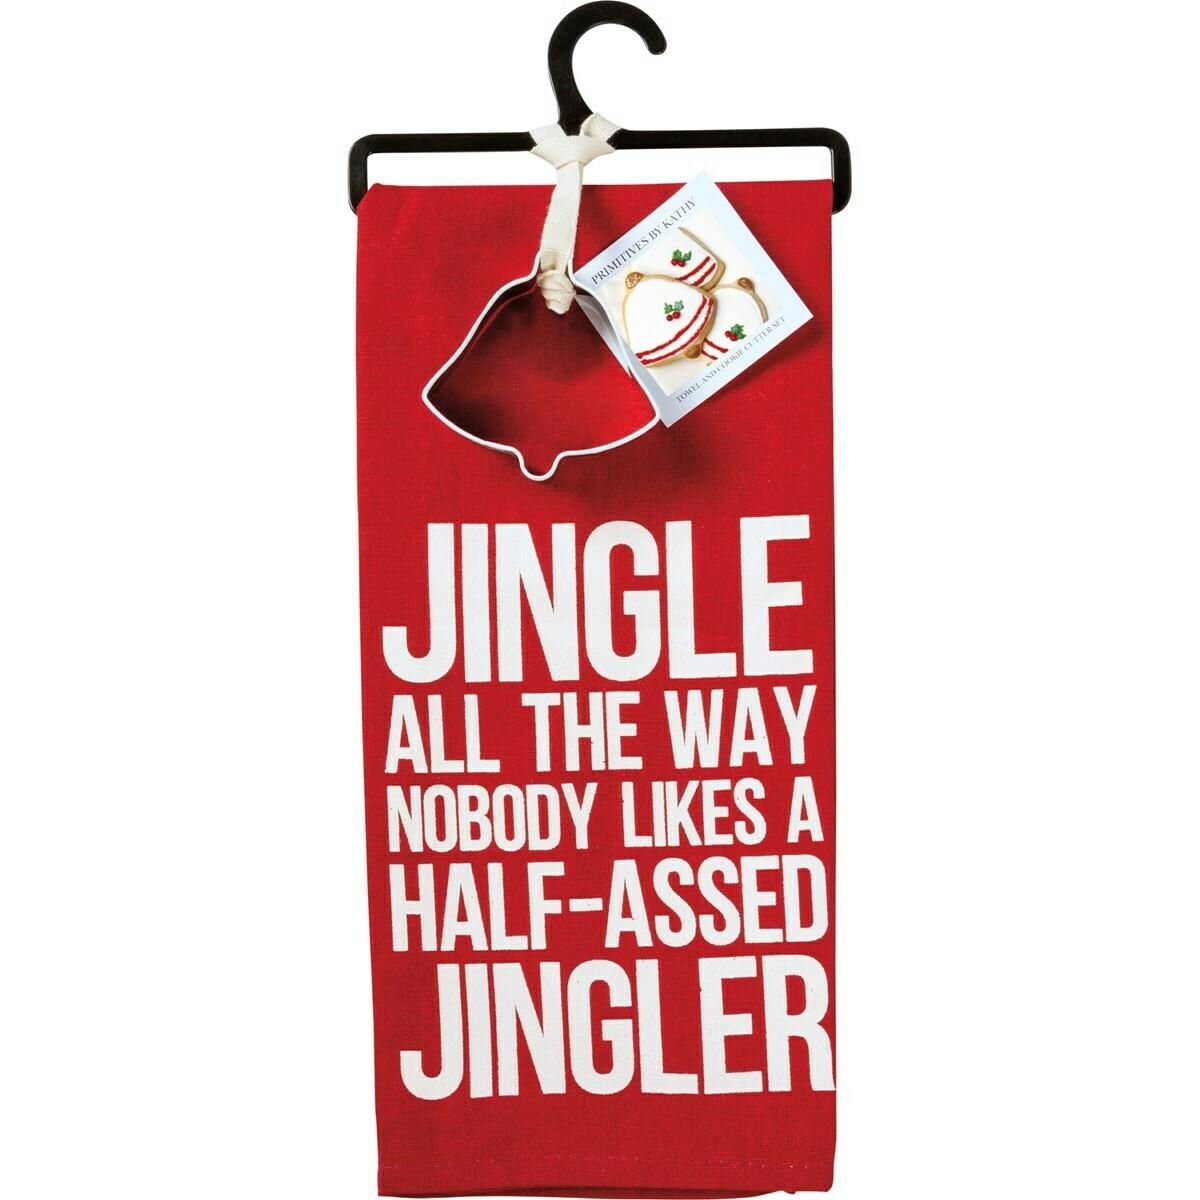 Jingler Towel & Cookie Cutter Set